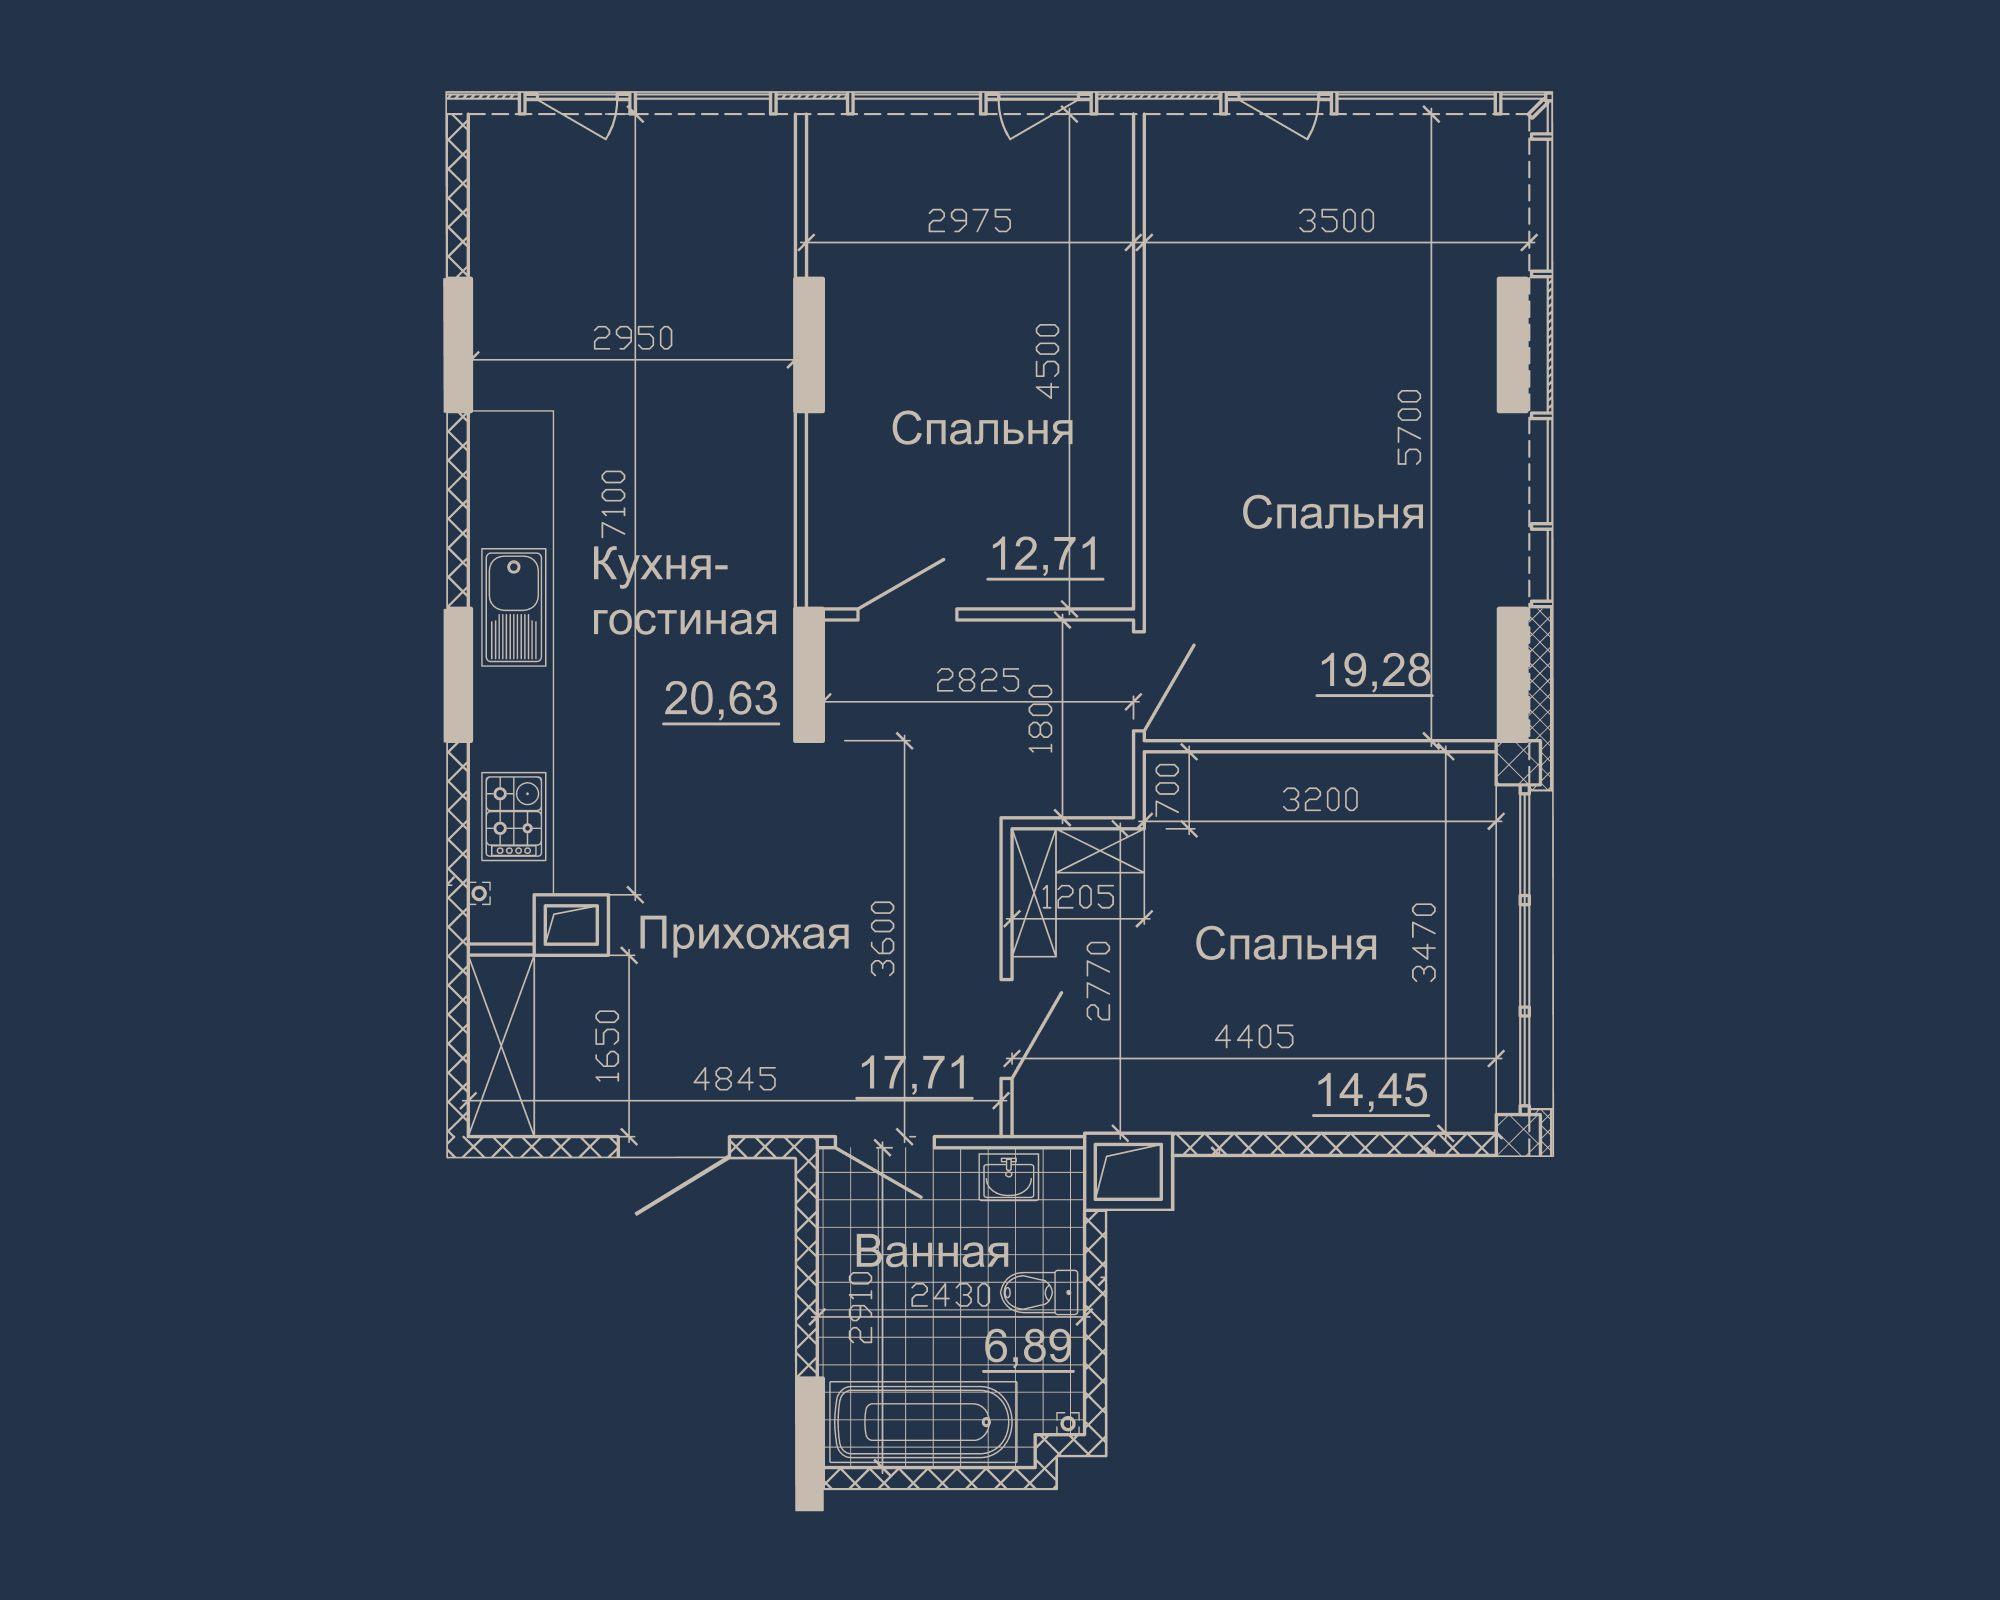 3-кімнатна квартира типу 01А-1 у ЖК Nebo